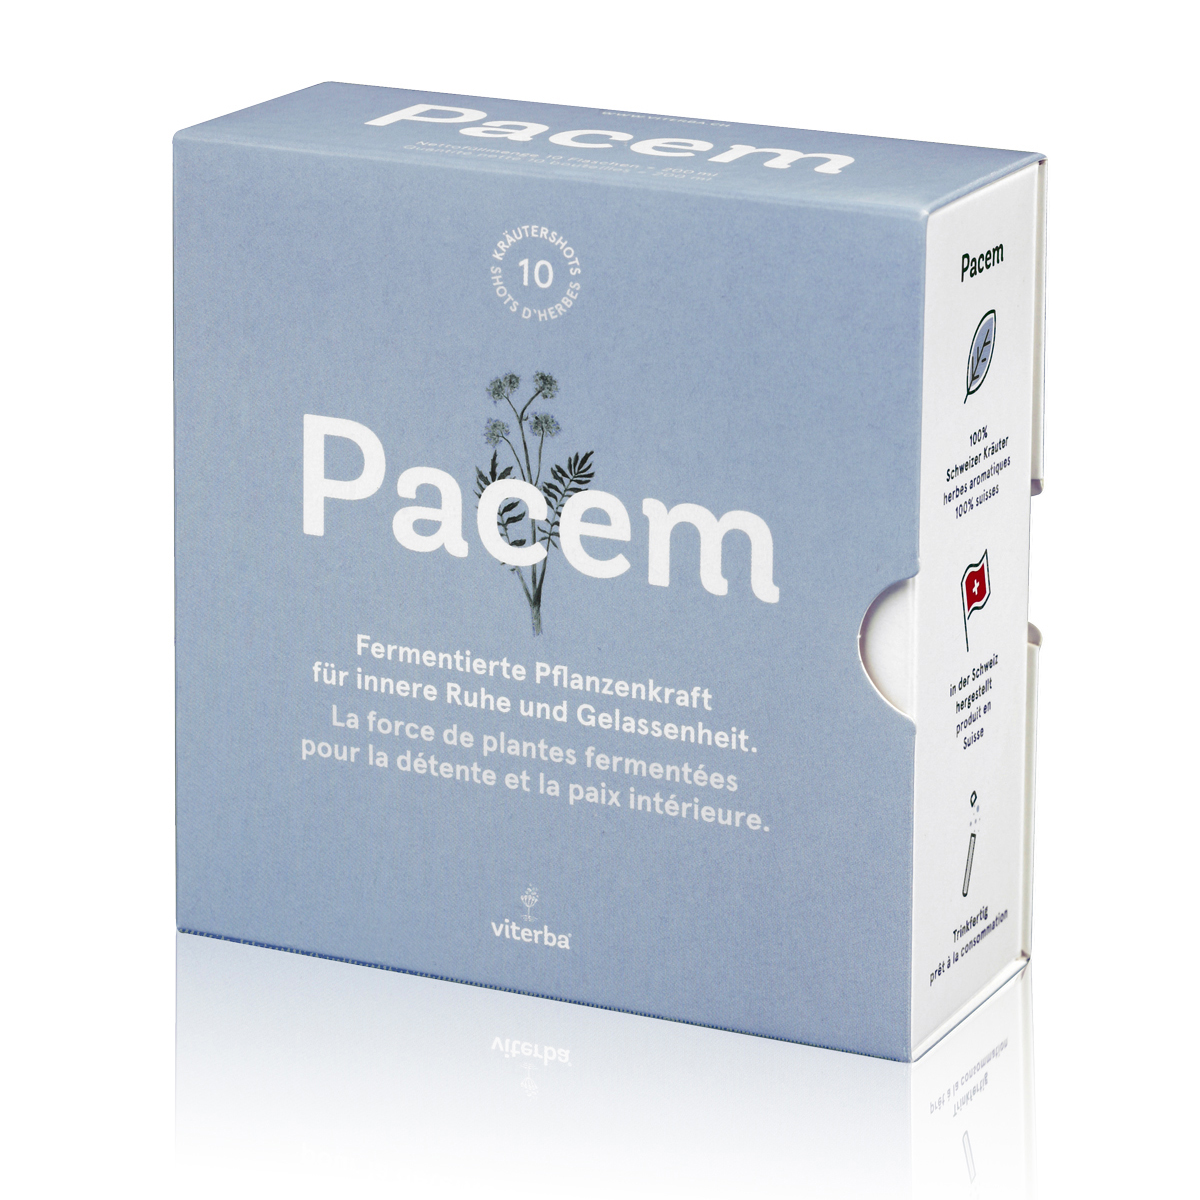 Viterba Pacem Box